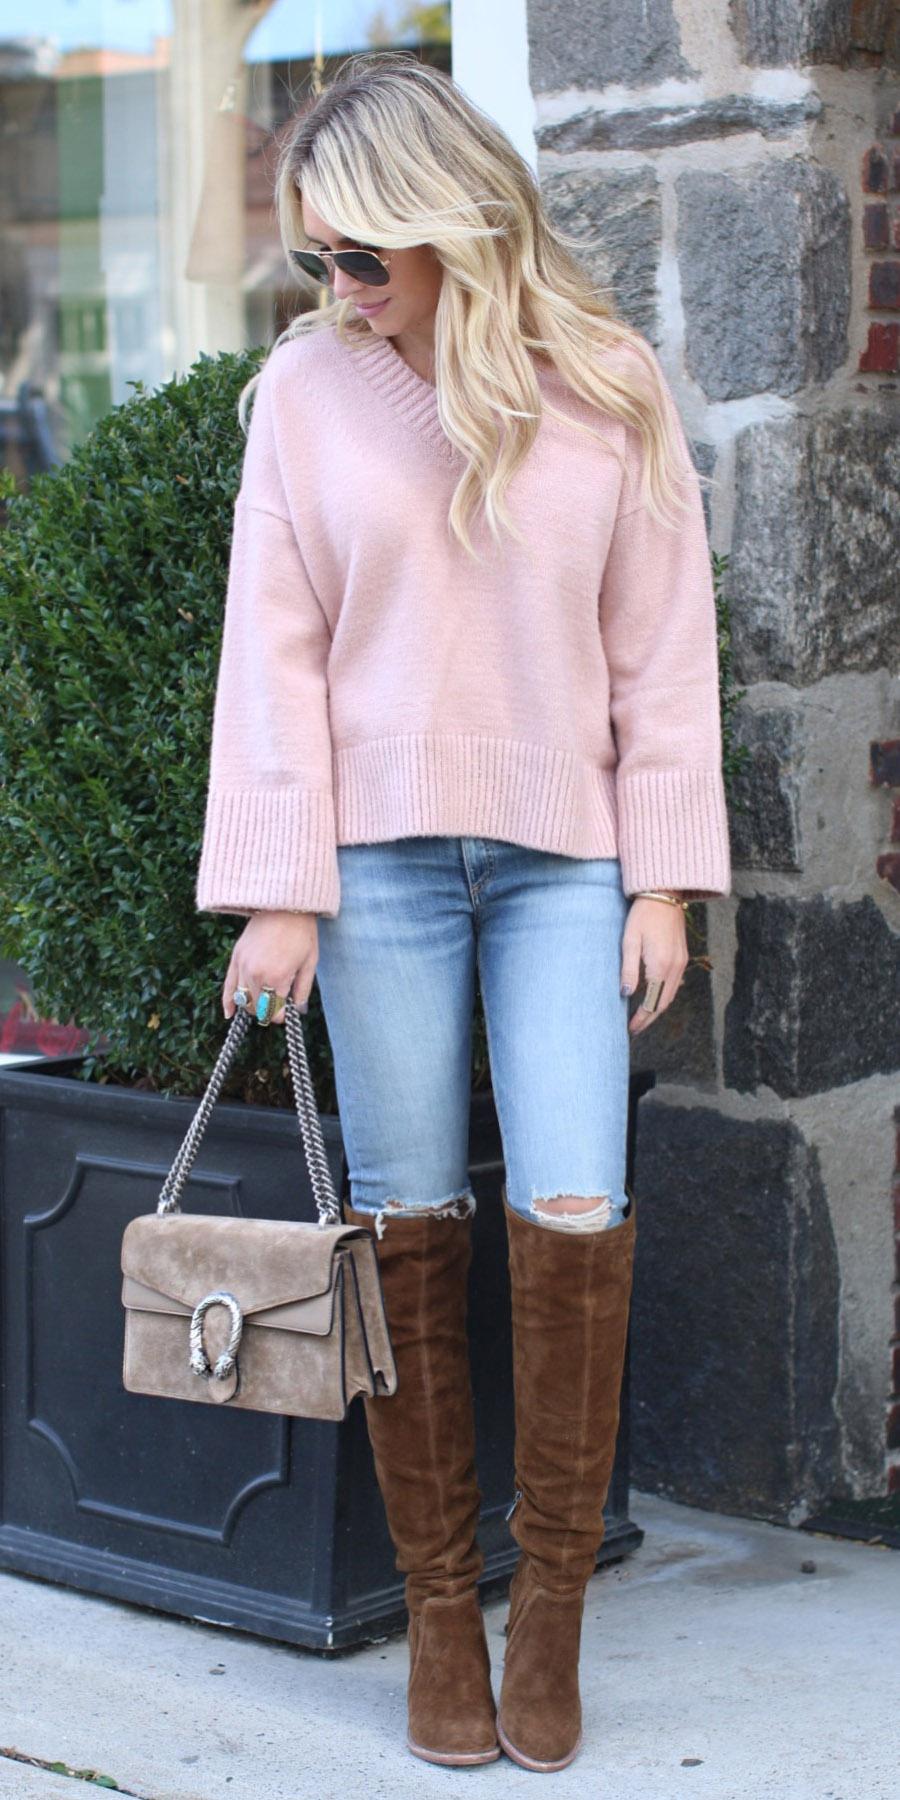 blue-light-skinny-jeans-pink-light-sweater-tan-bag-brown-shoe-boots-fall-winter-blonde-lunch.jpg